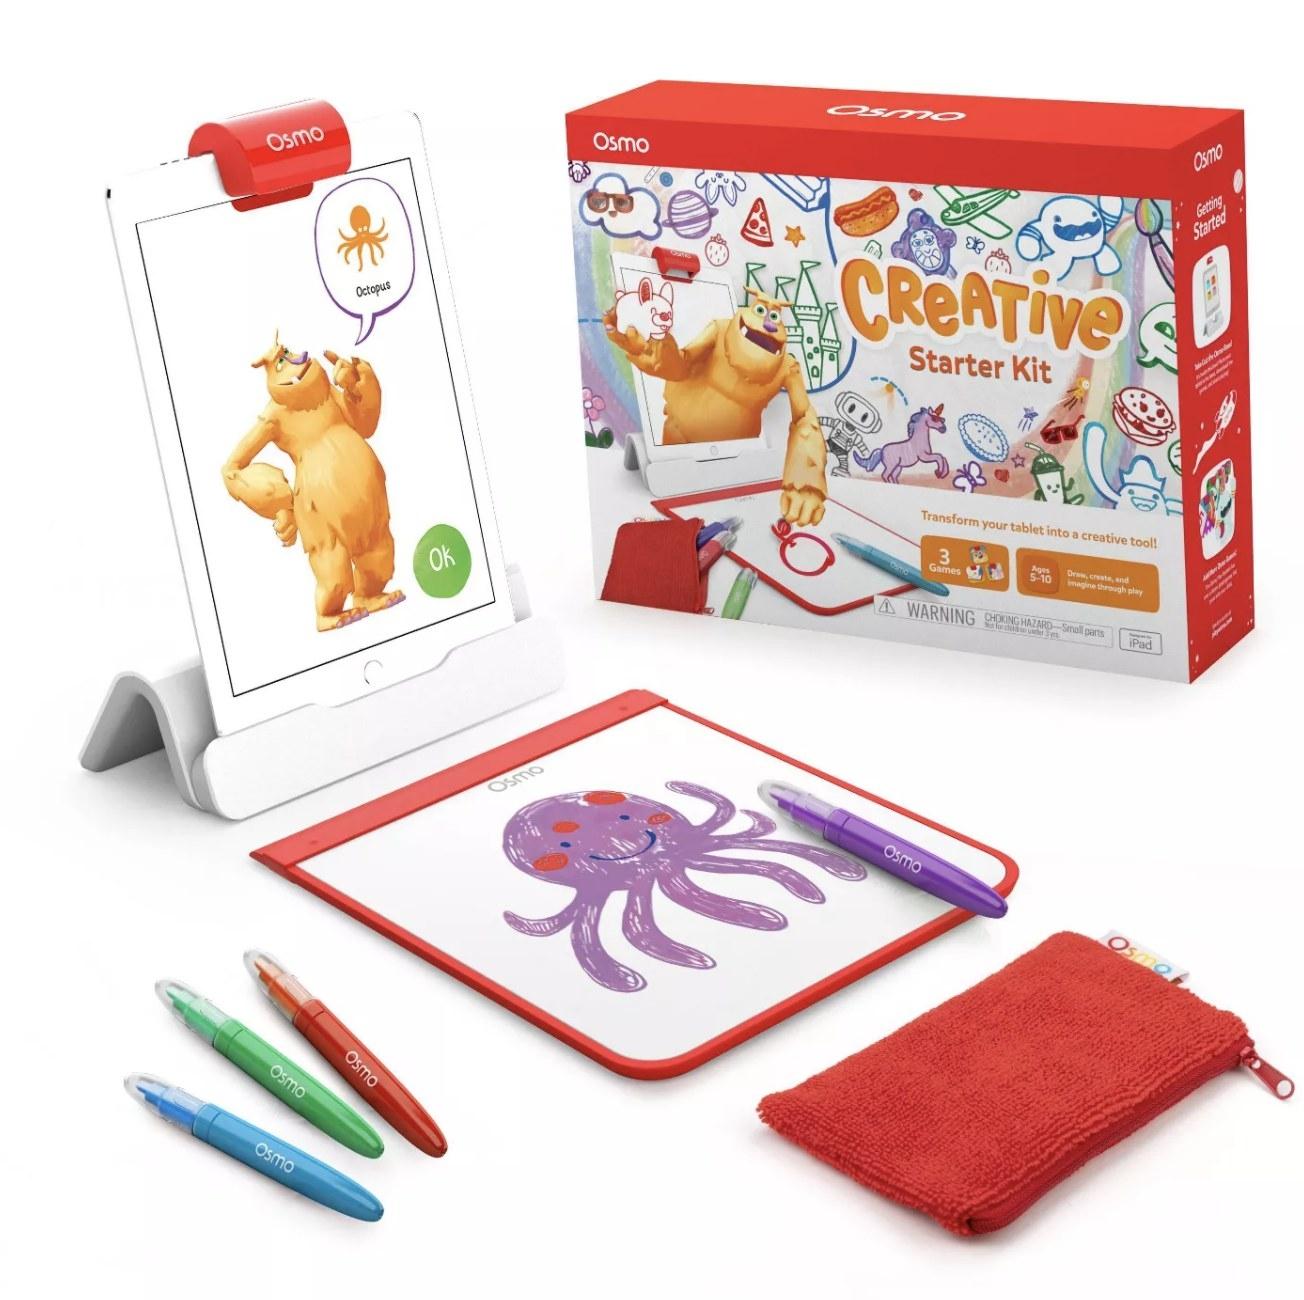 The creative kit